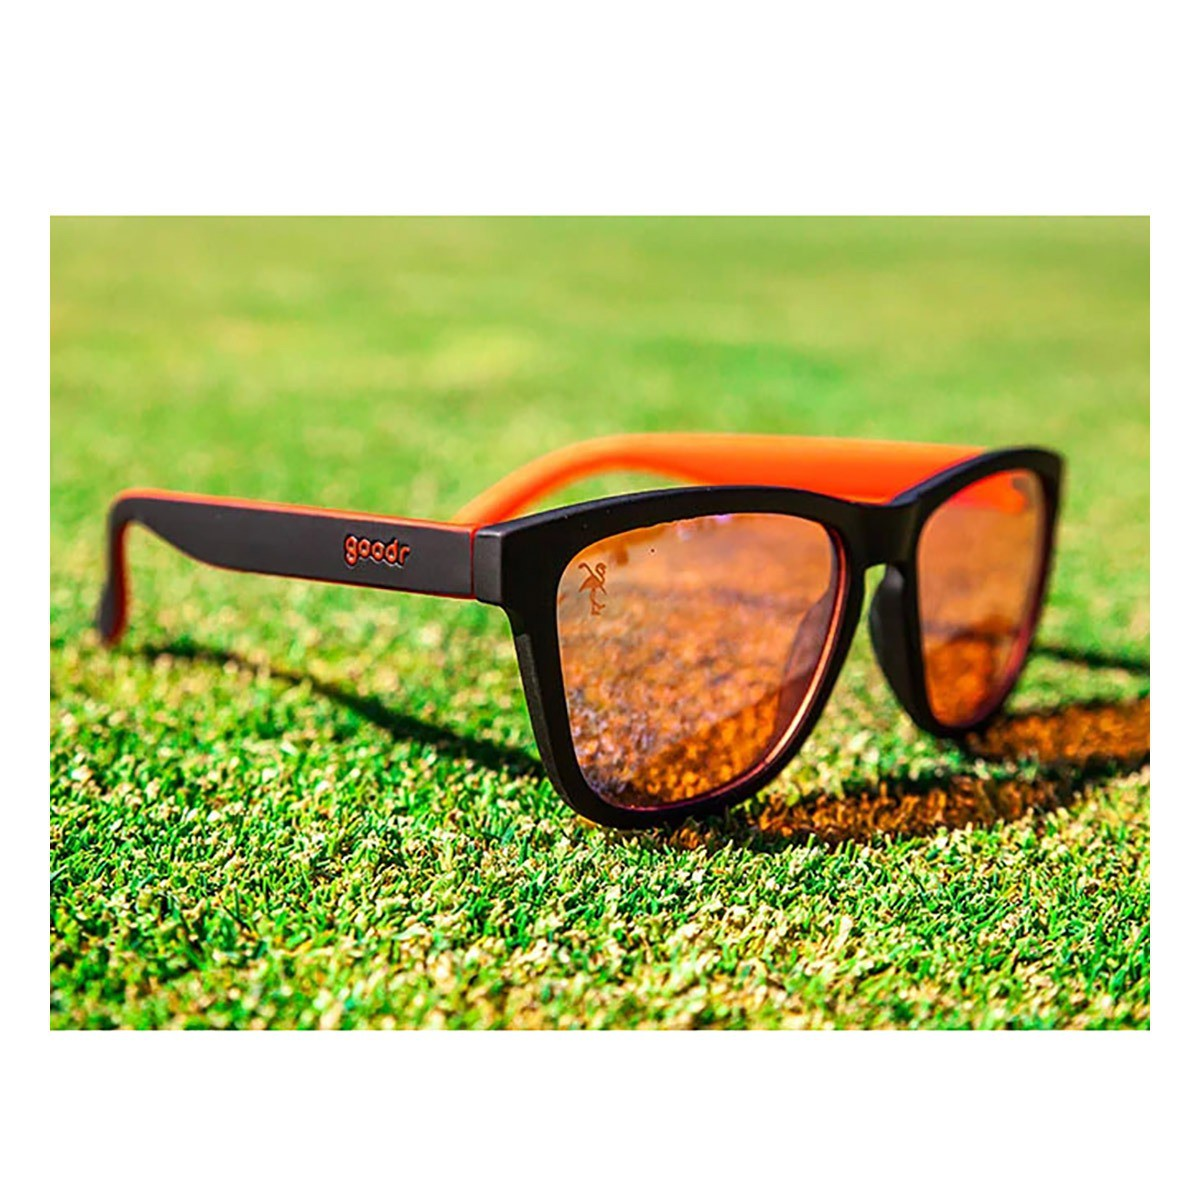 Oculos de Sol Goodr -   Tiger Blood Transfusion